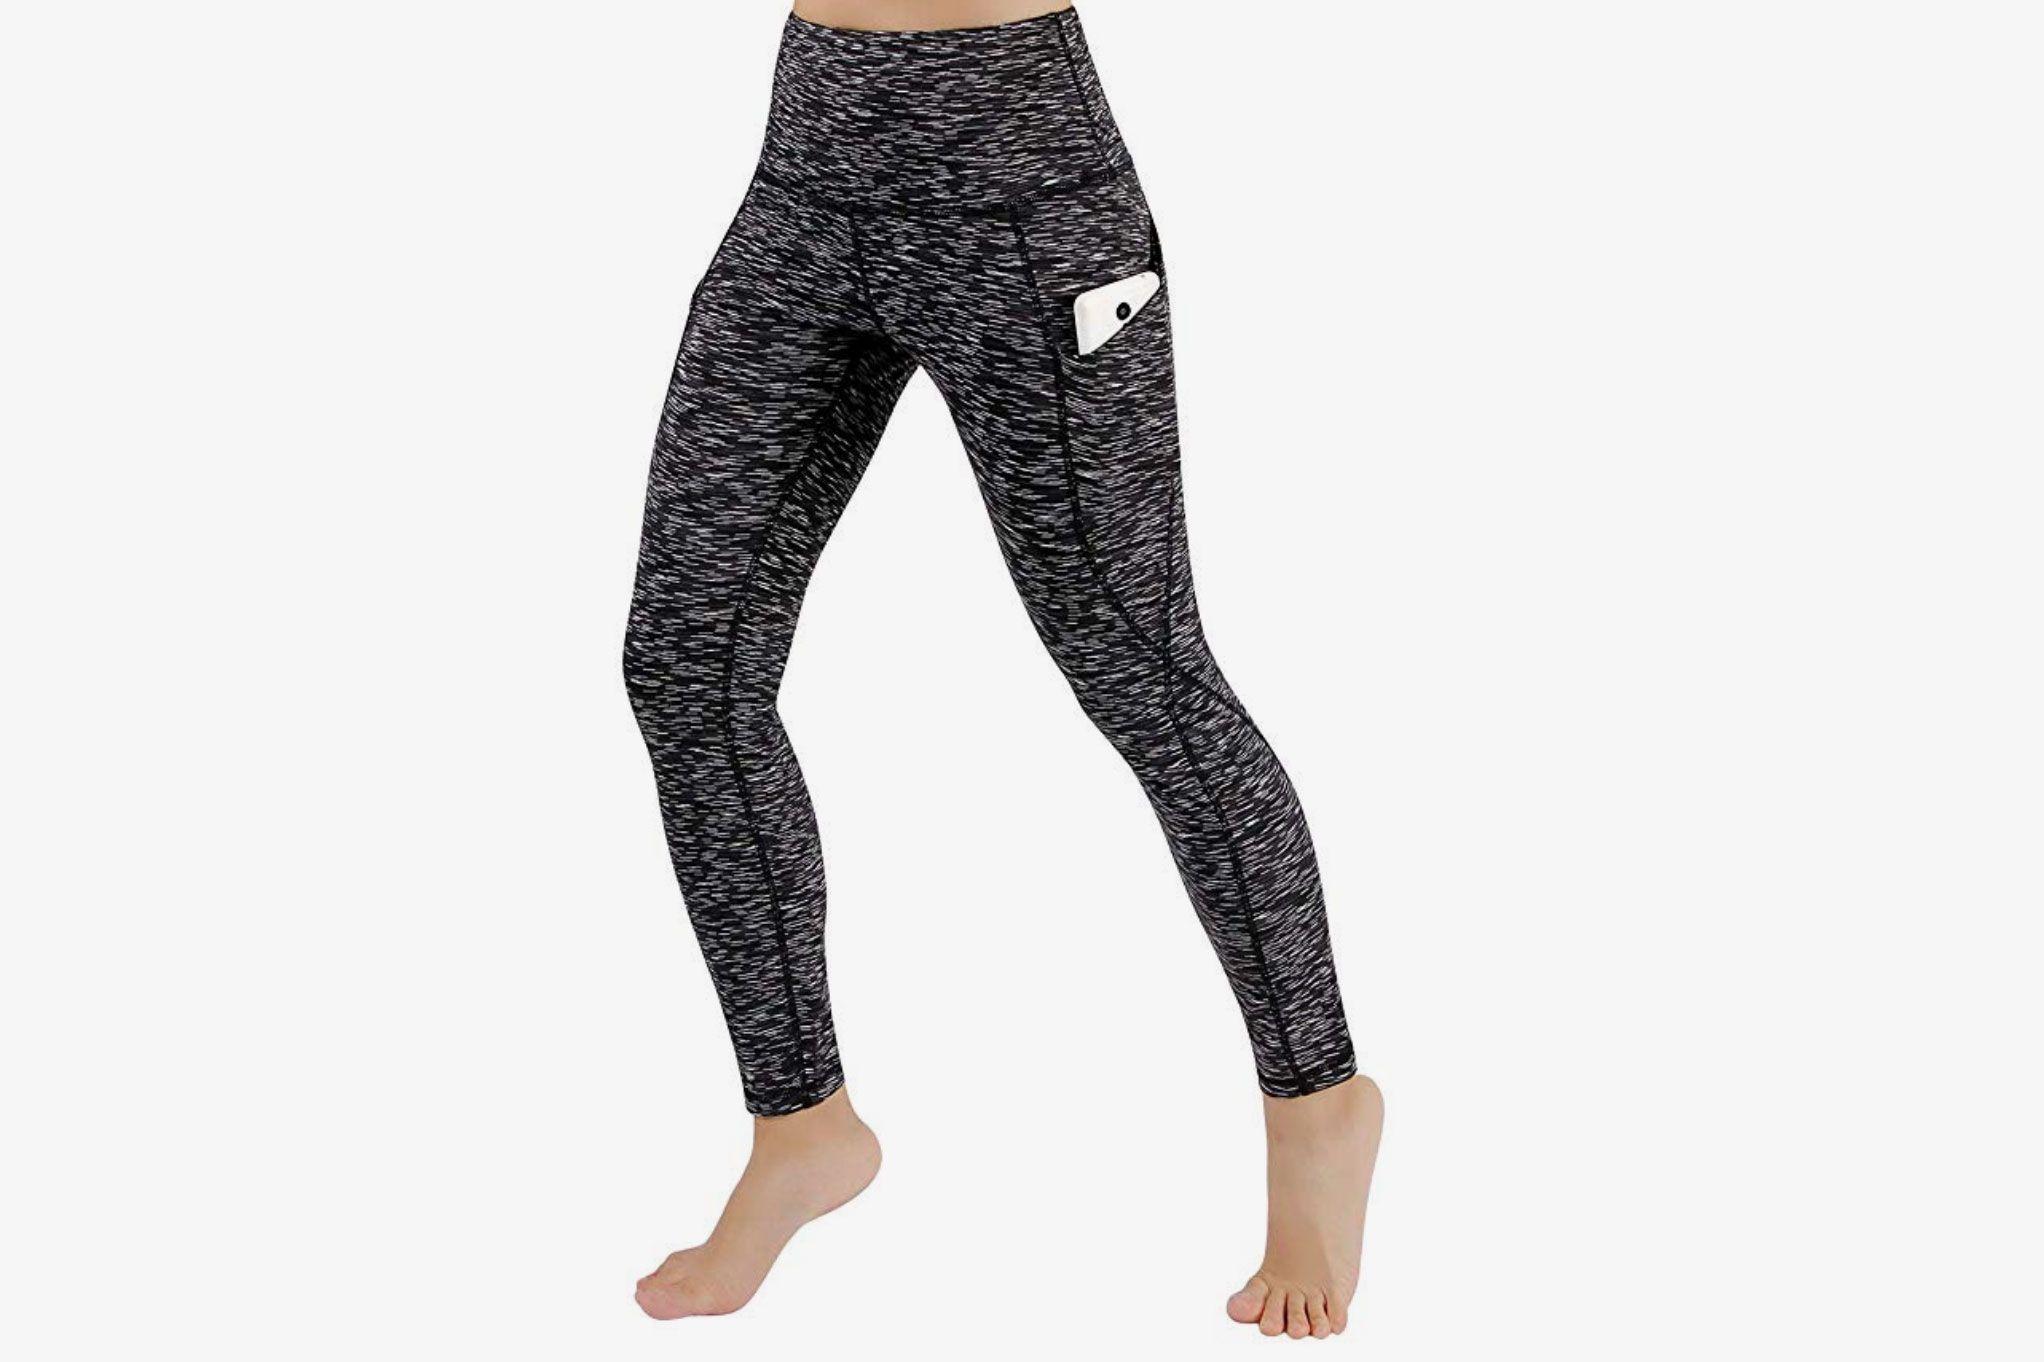 Black YOGA tights Dance leggings BLACK LEGGINGS Cotton lycra Sport Leggings Gym leggings Yoga wear Black Tights Sport wear